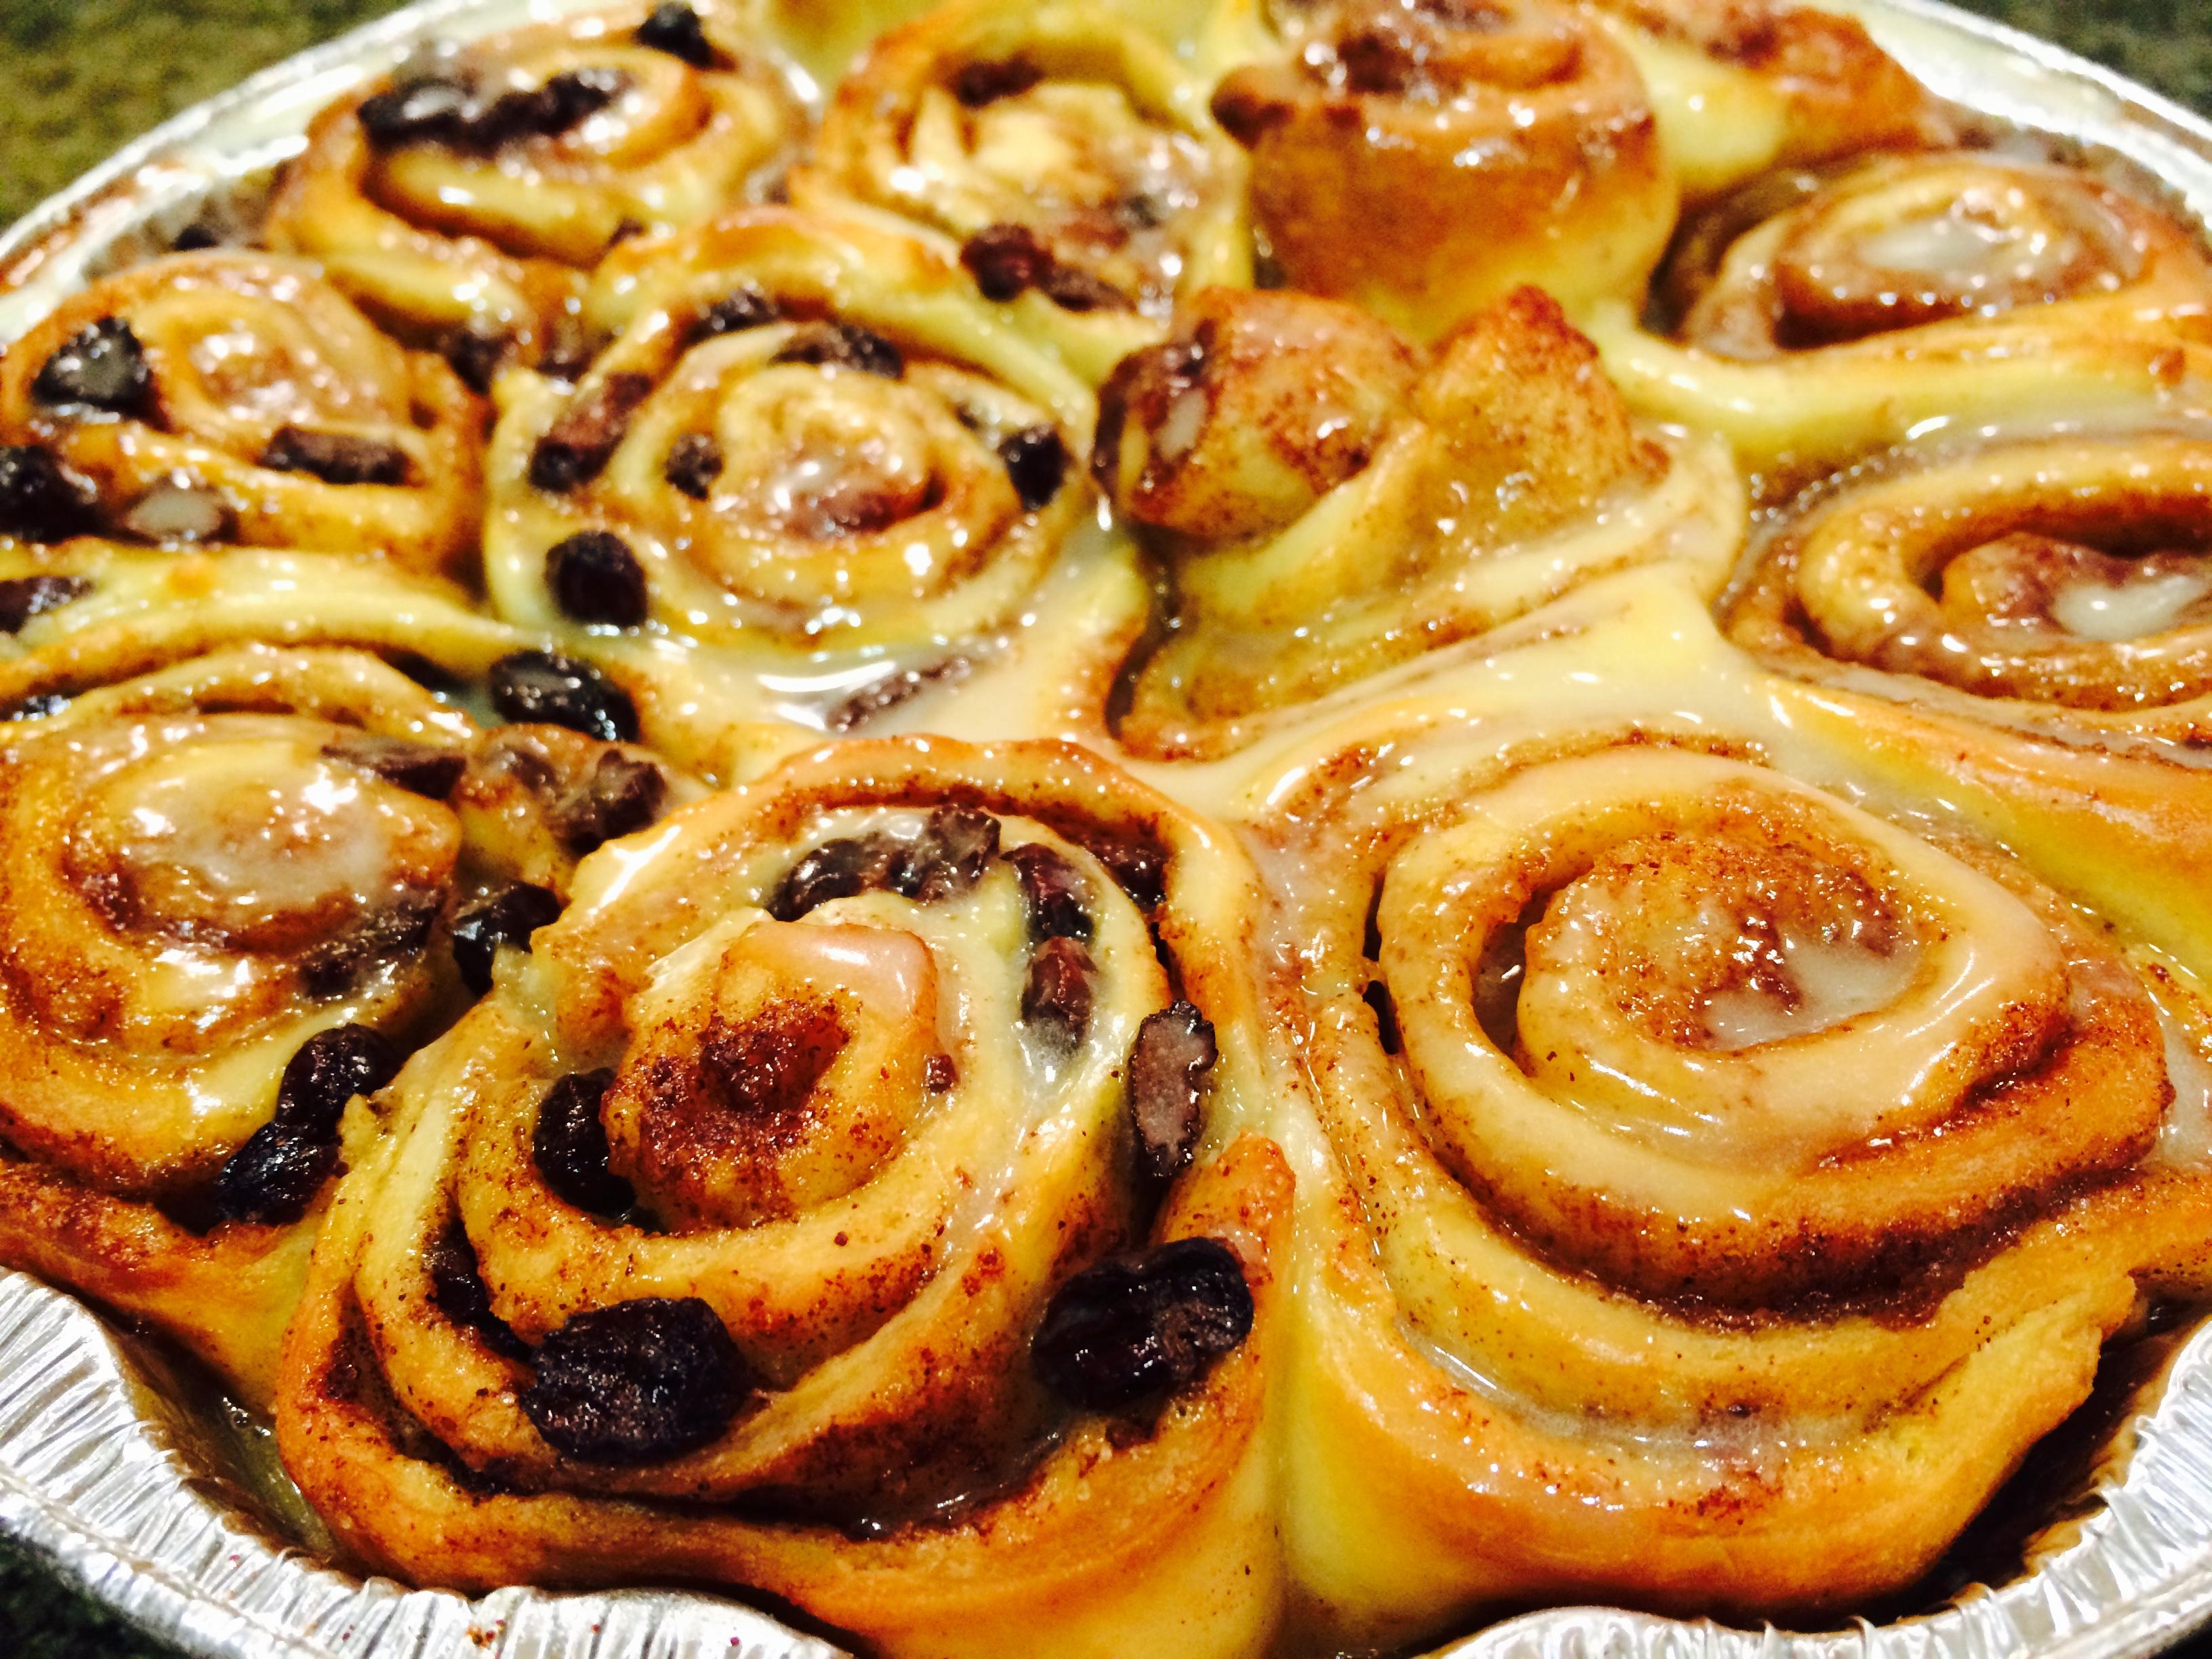 cinnamon buns cinnamon pizza buns cinnamon sticky buns cinnamon raisin ...